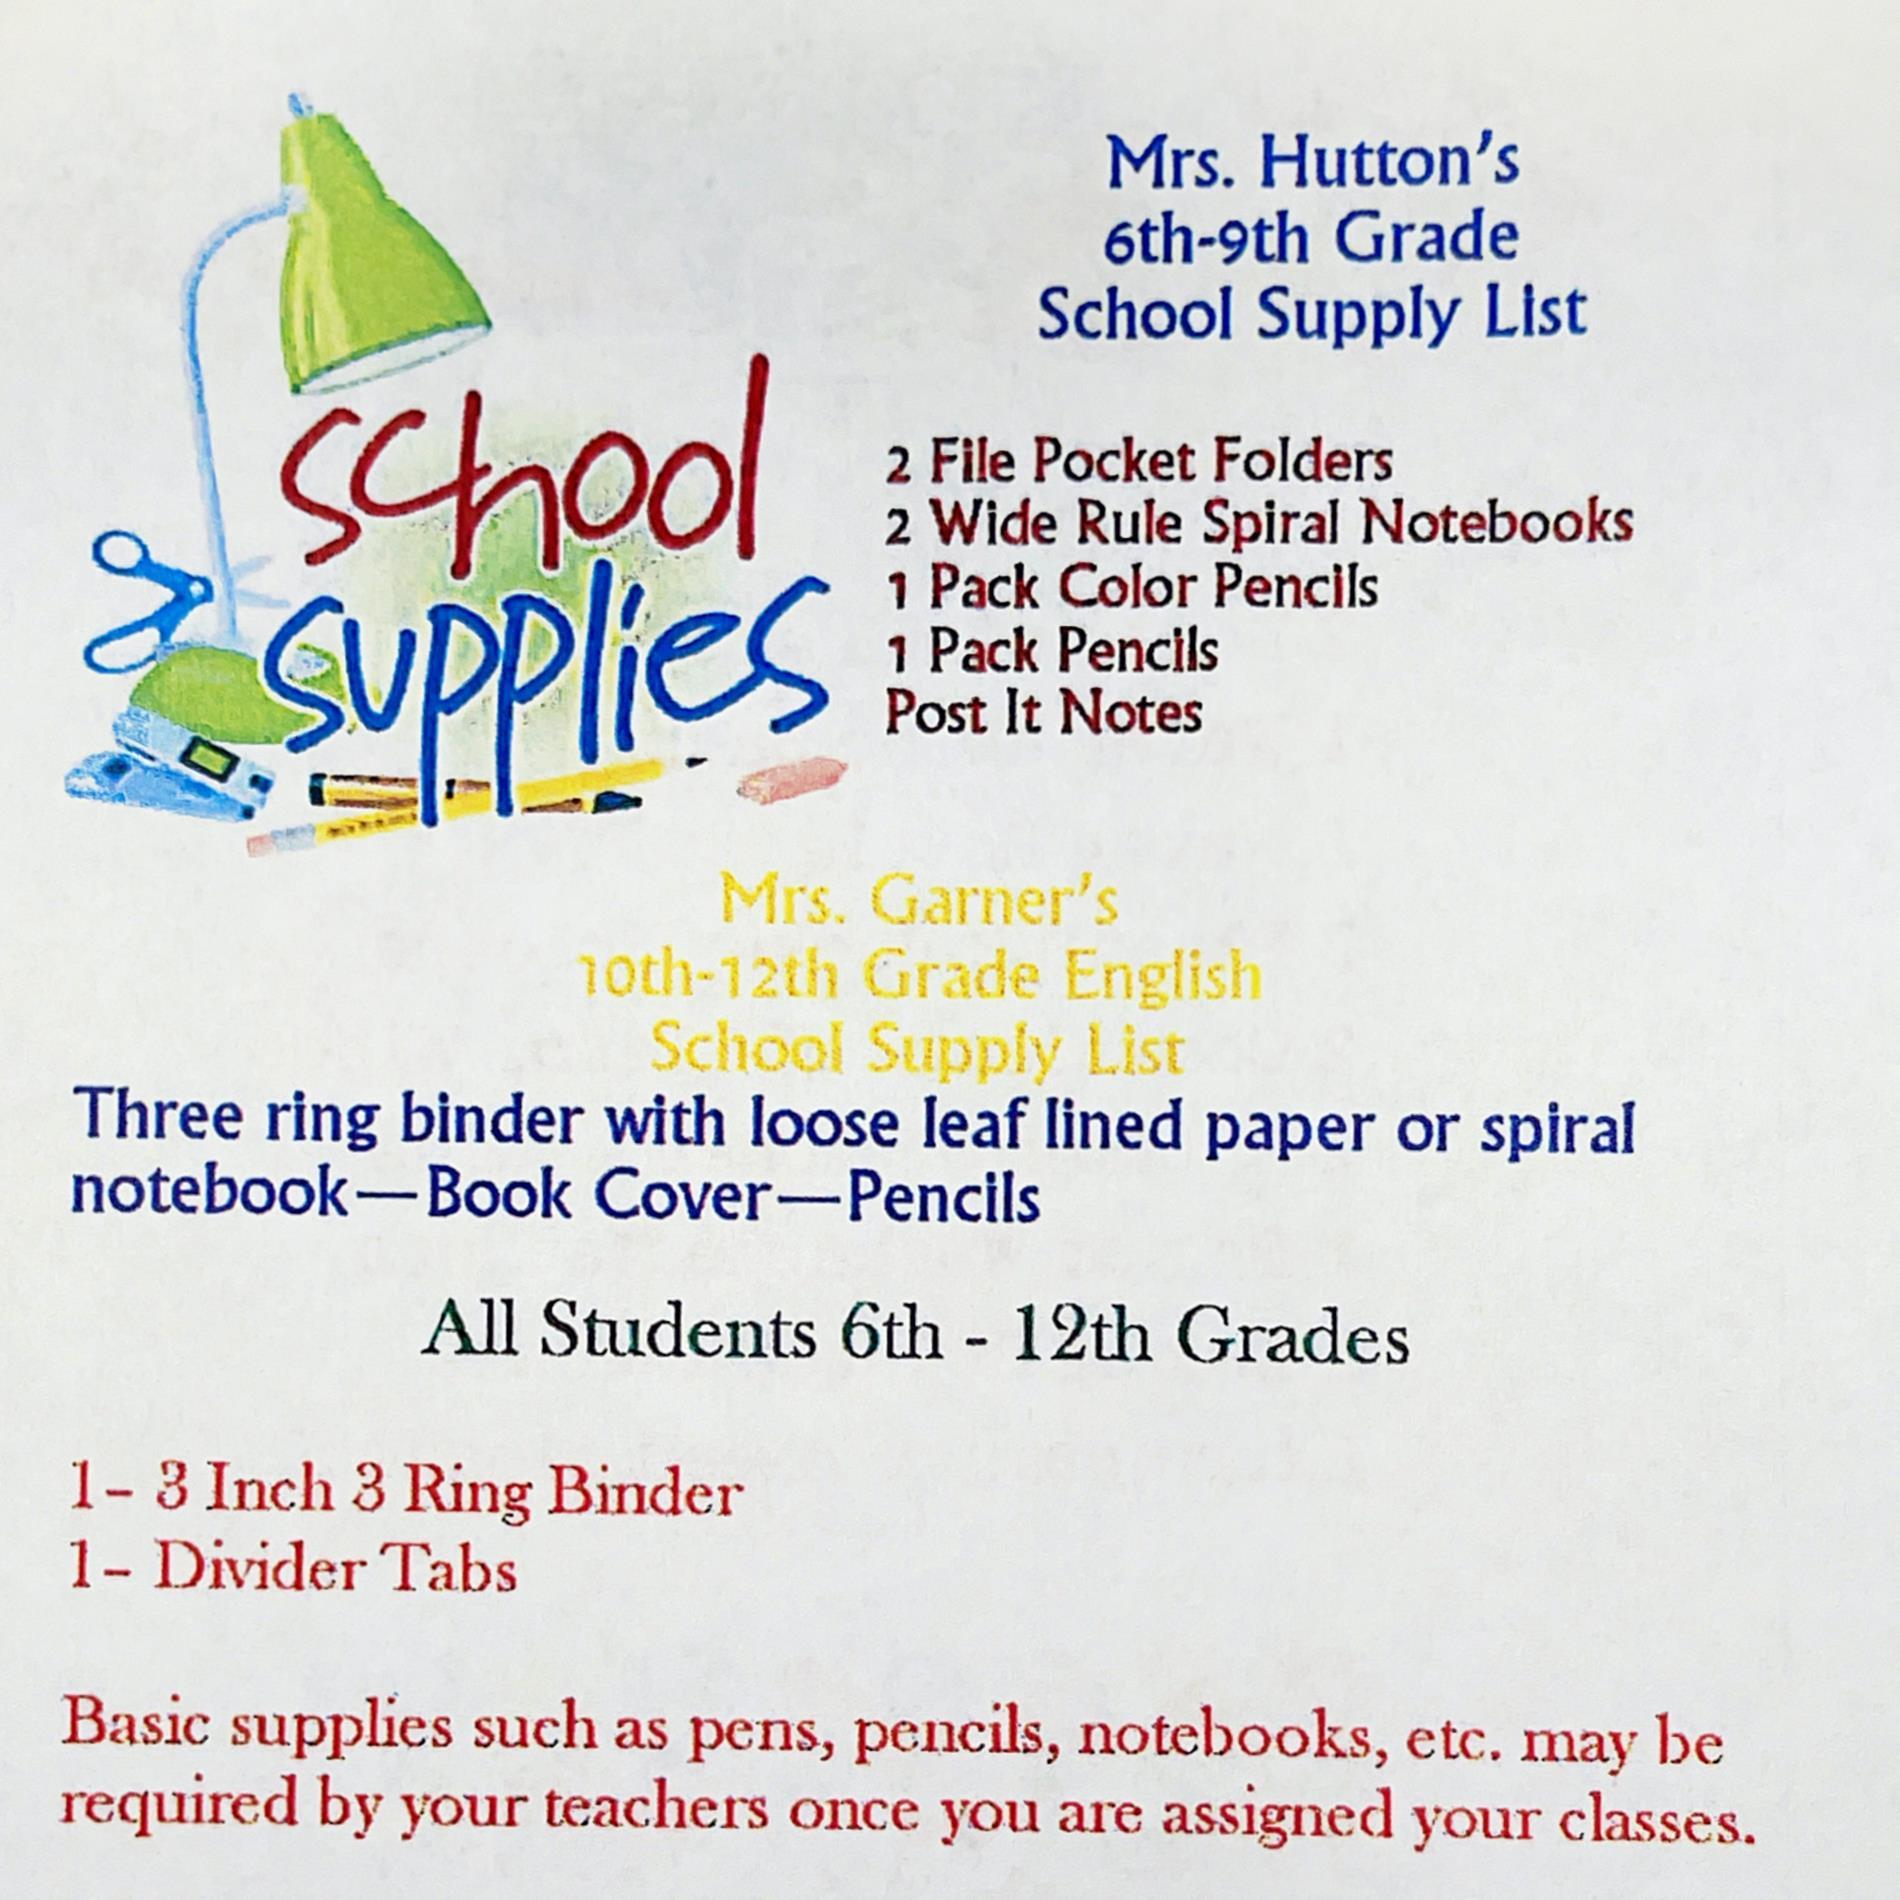 6th-9th Grade List